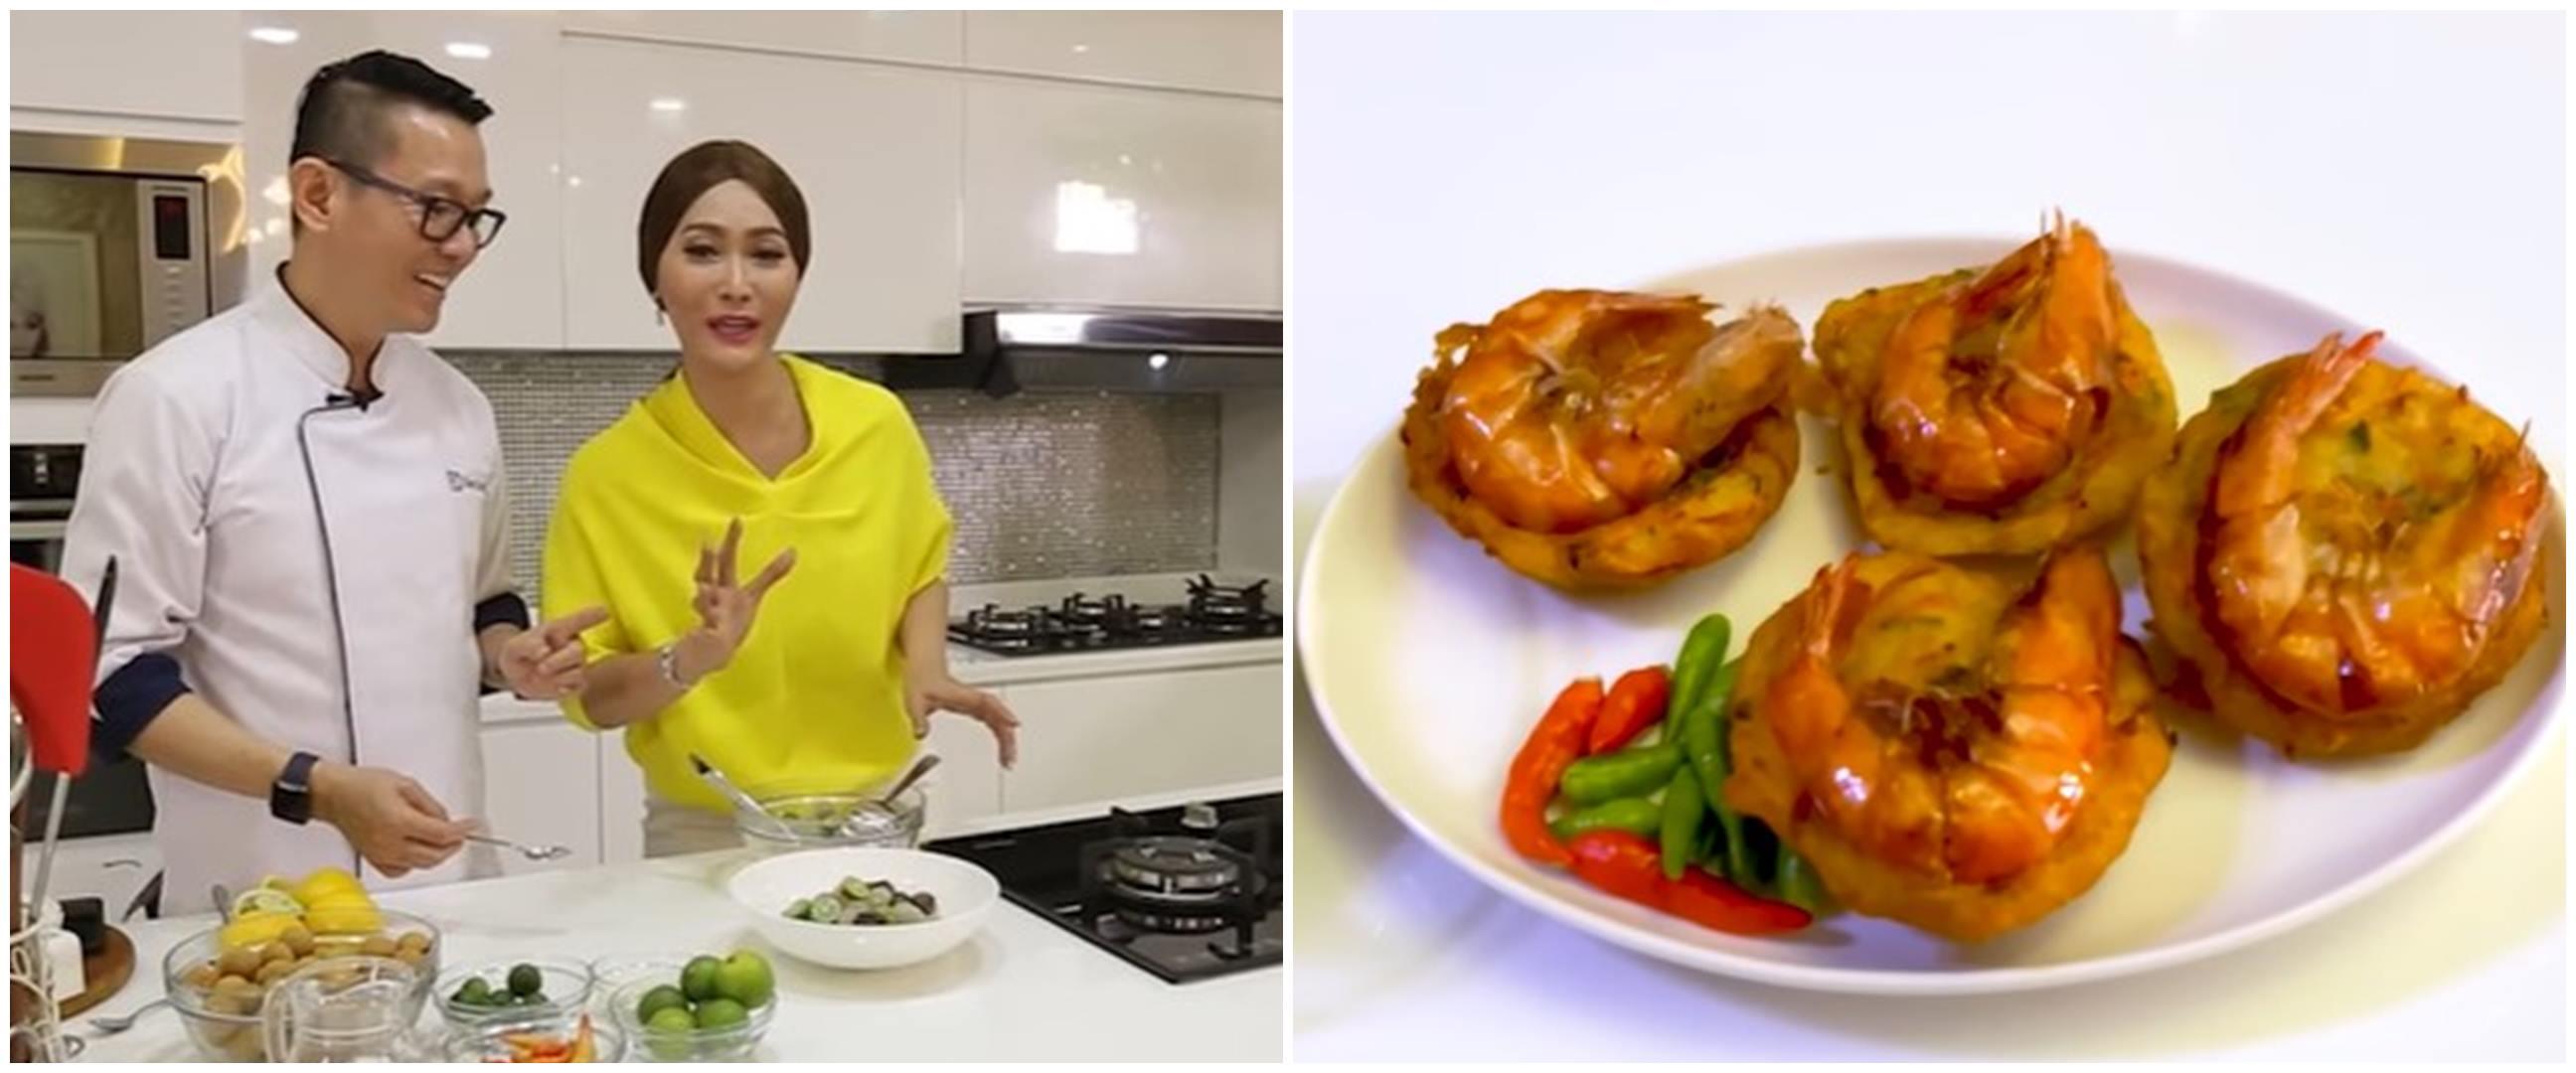 9 Resep masakan pedas ala Inul Daratista, nampol abis